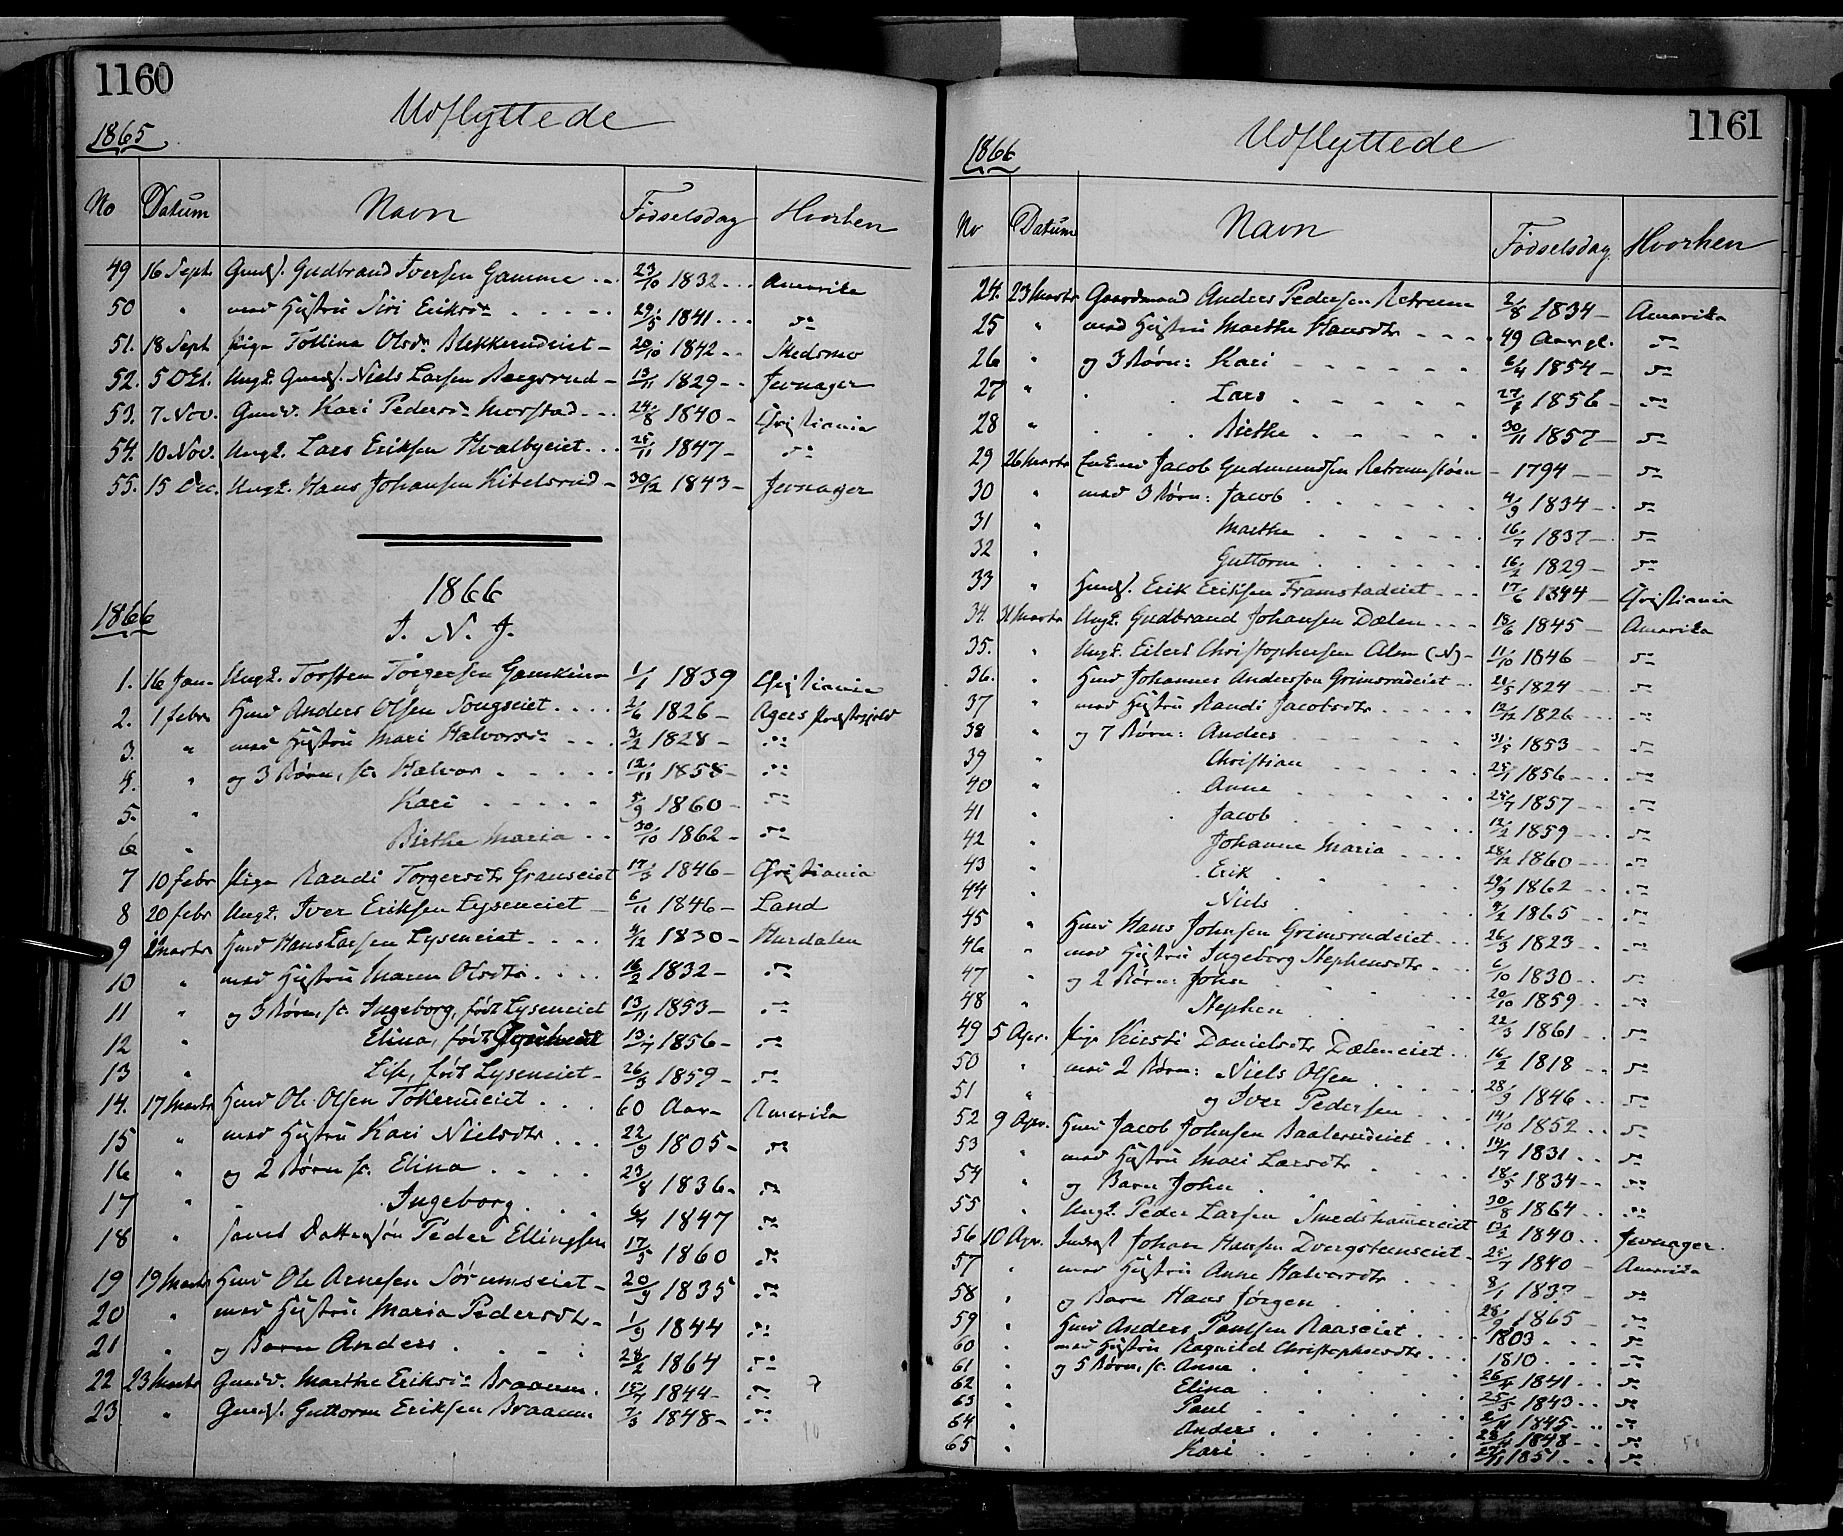 SAH, Gran prestekontor, Ministerialbok nr. 12, 1856-1874, s. 1160-1161